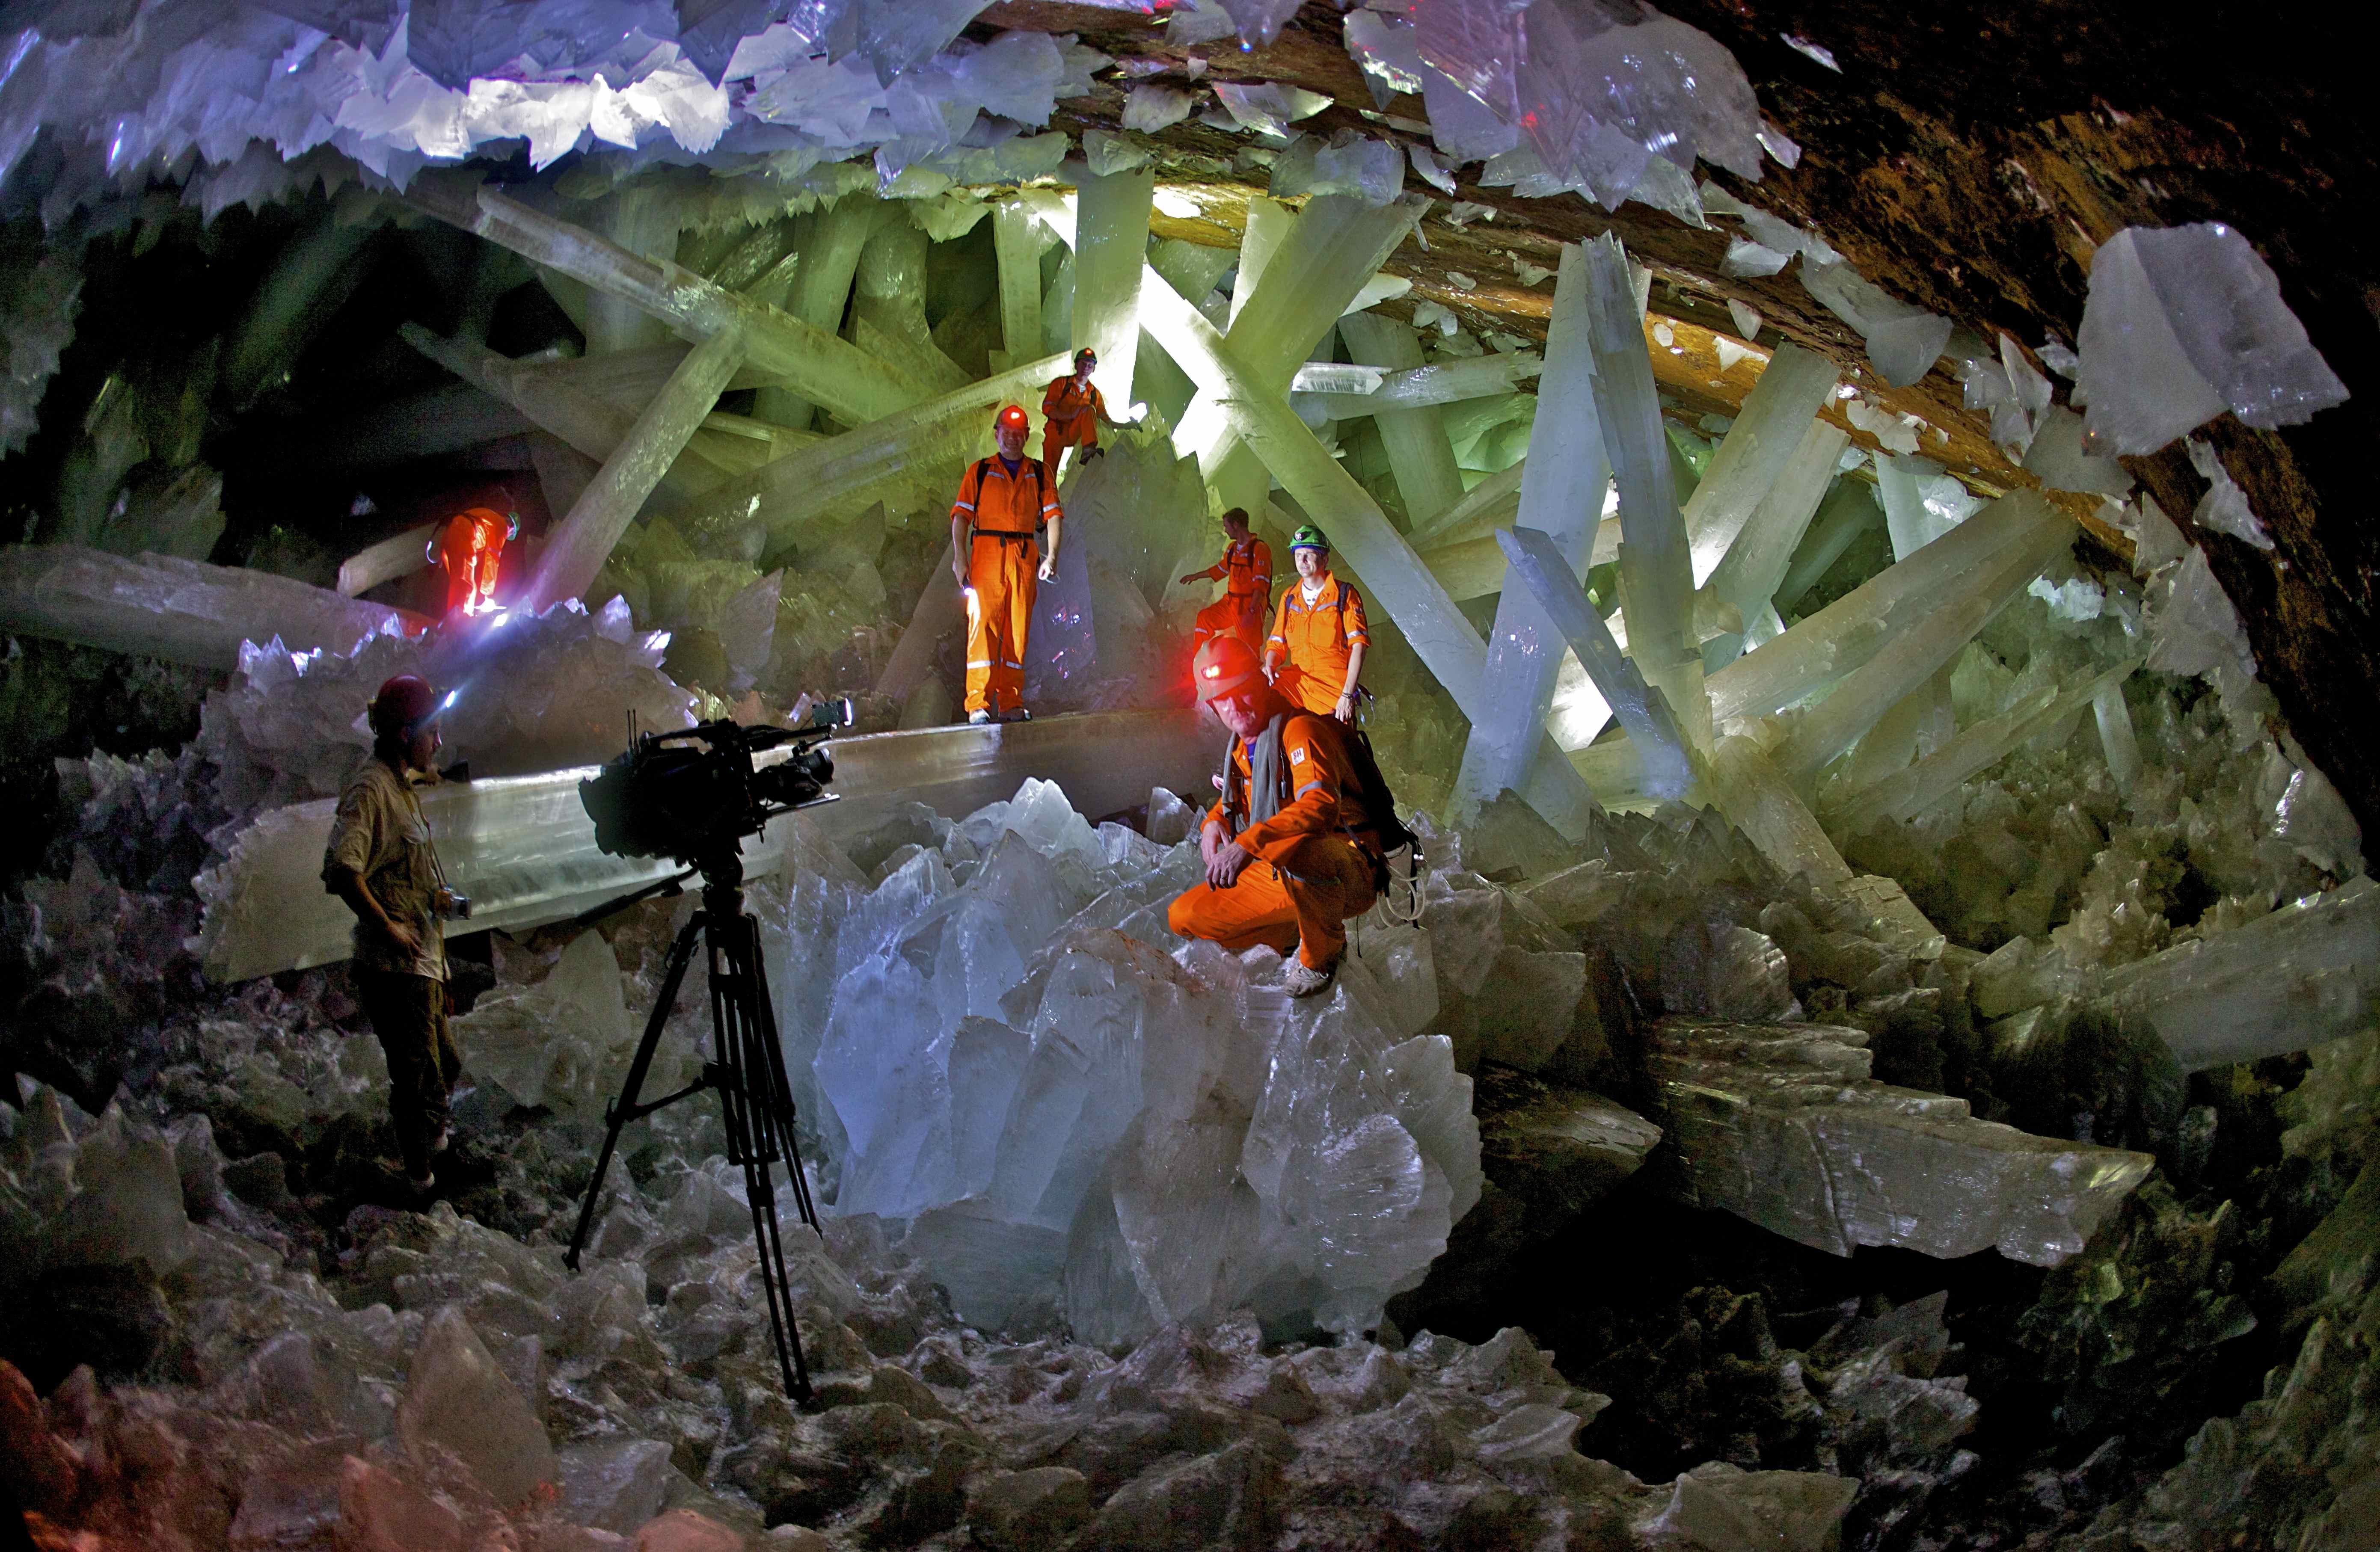 Crystal cave explorers